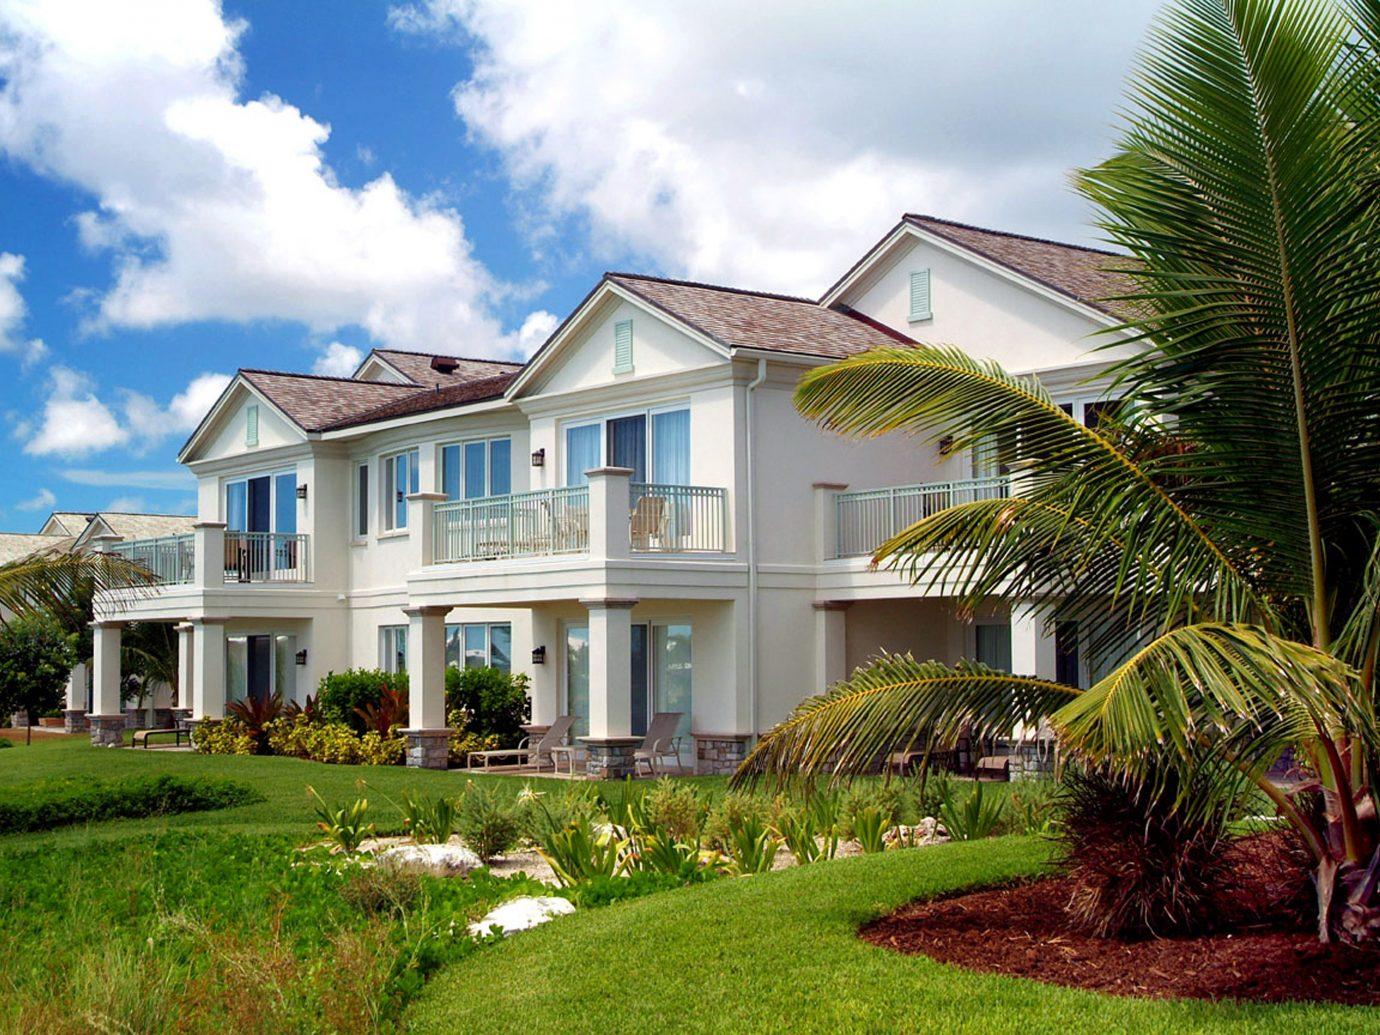 Exterior view of Grand Isle Resort